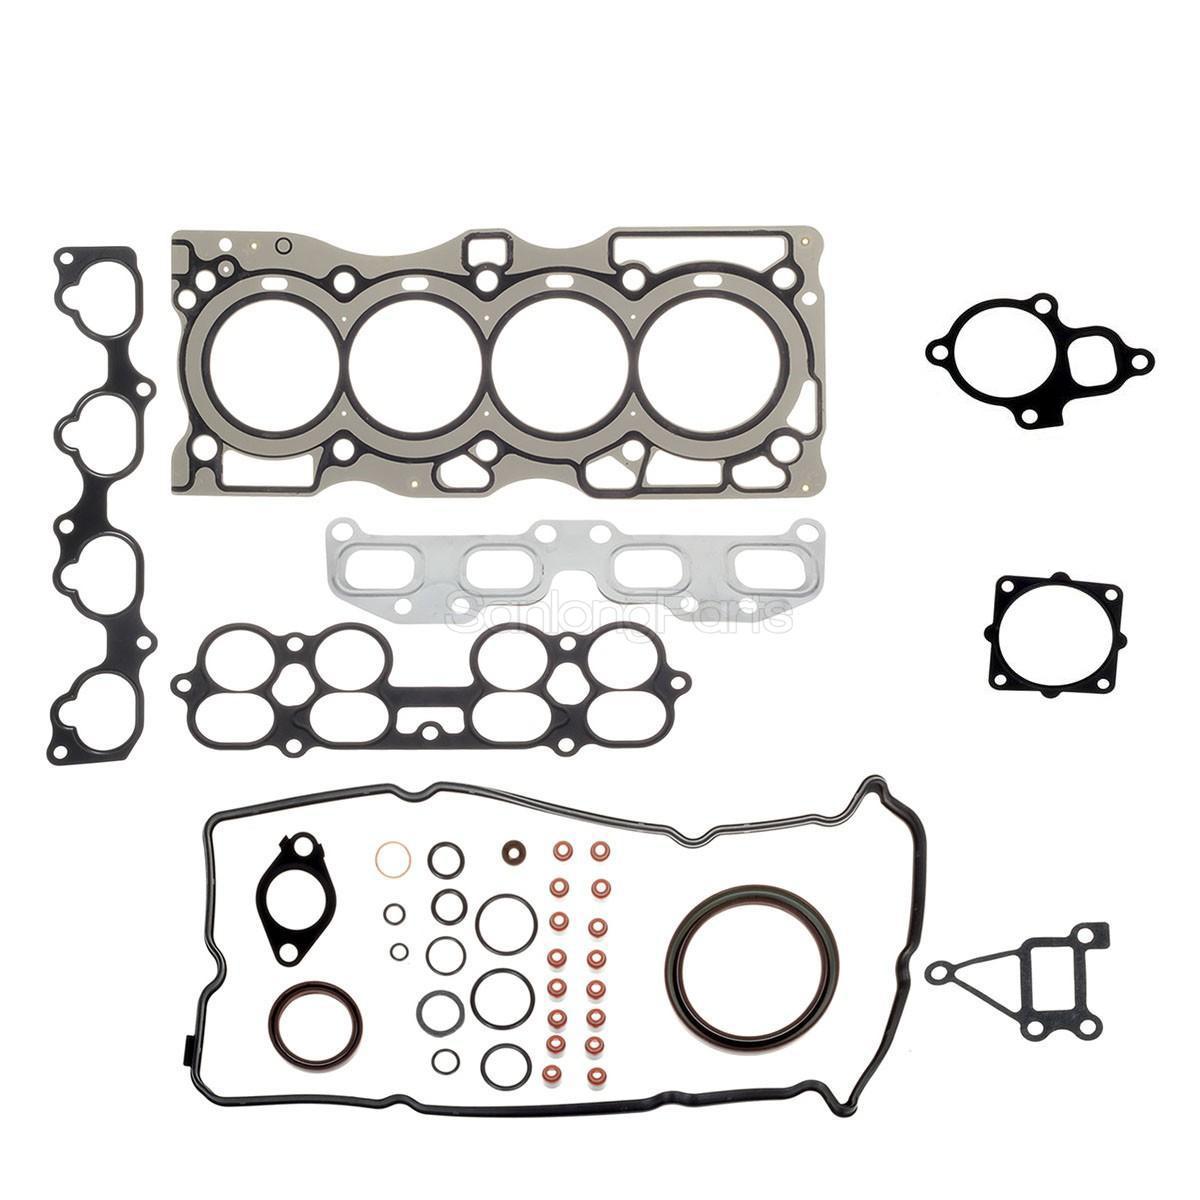 Fits Nissan Altima Sentra Ser 2 5 Cylinder Head